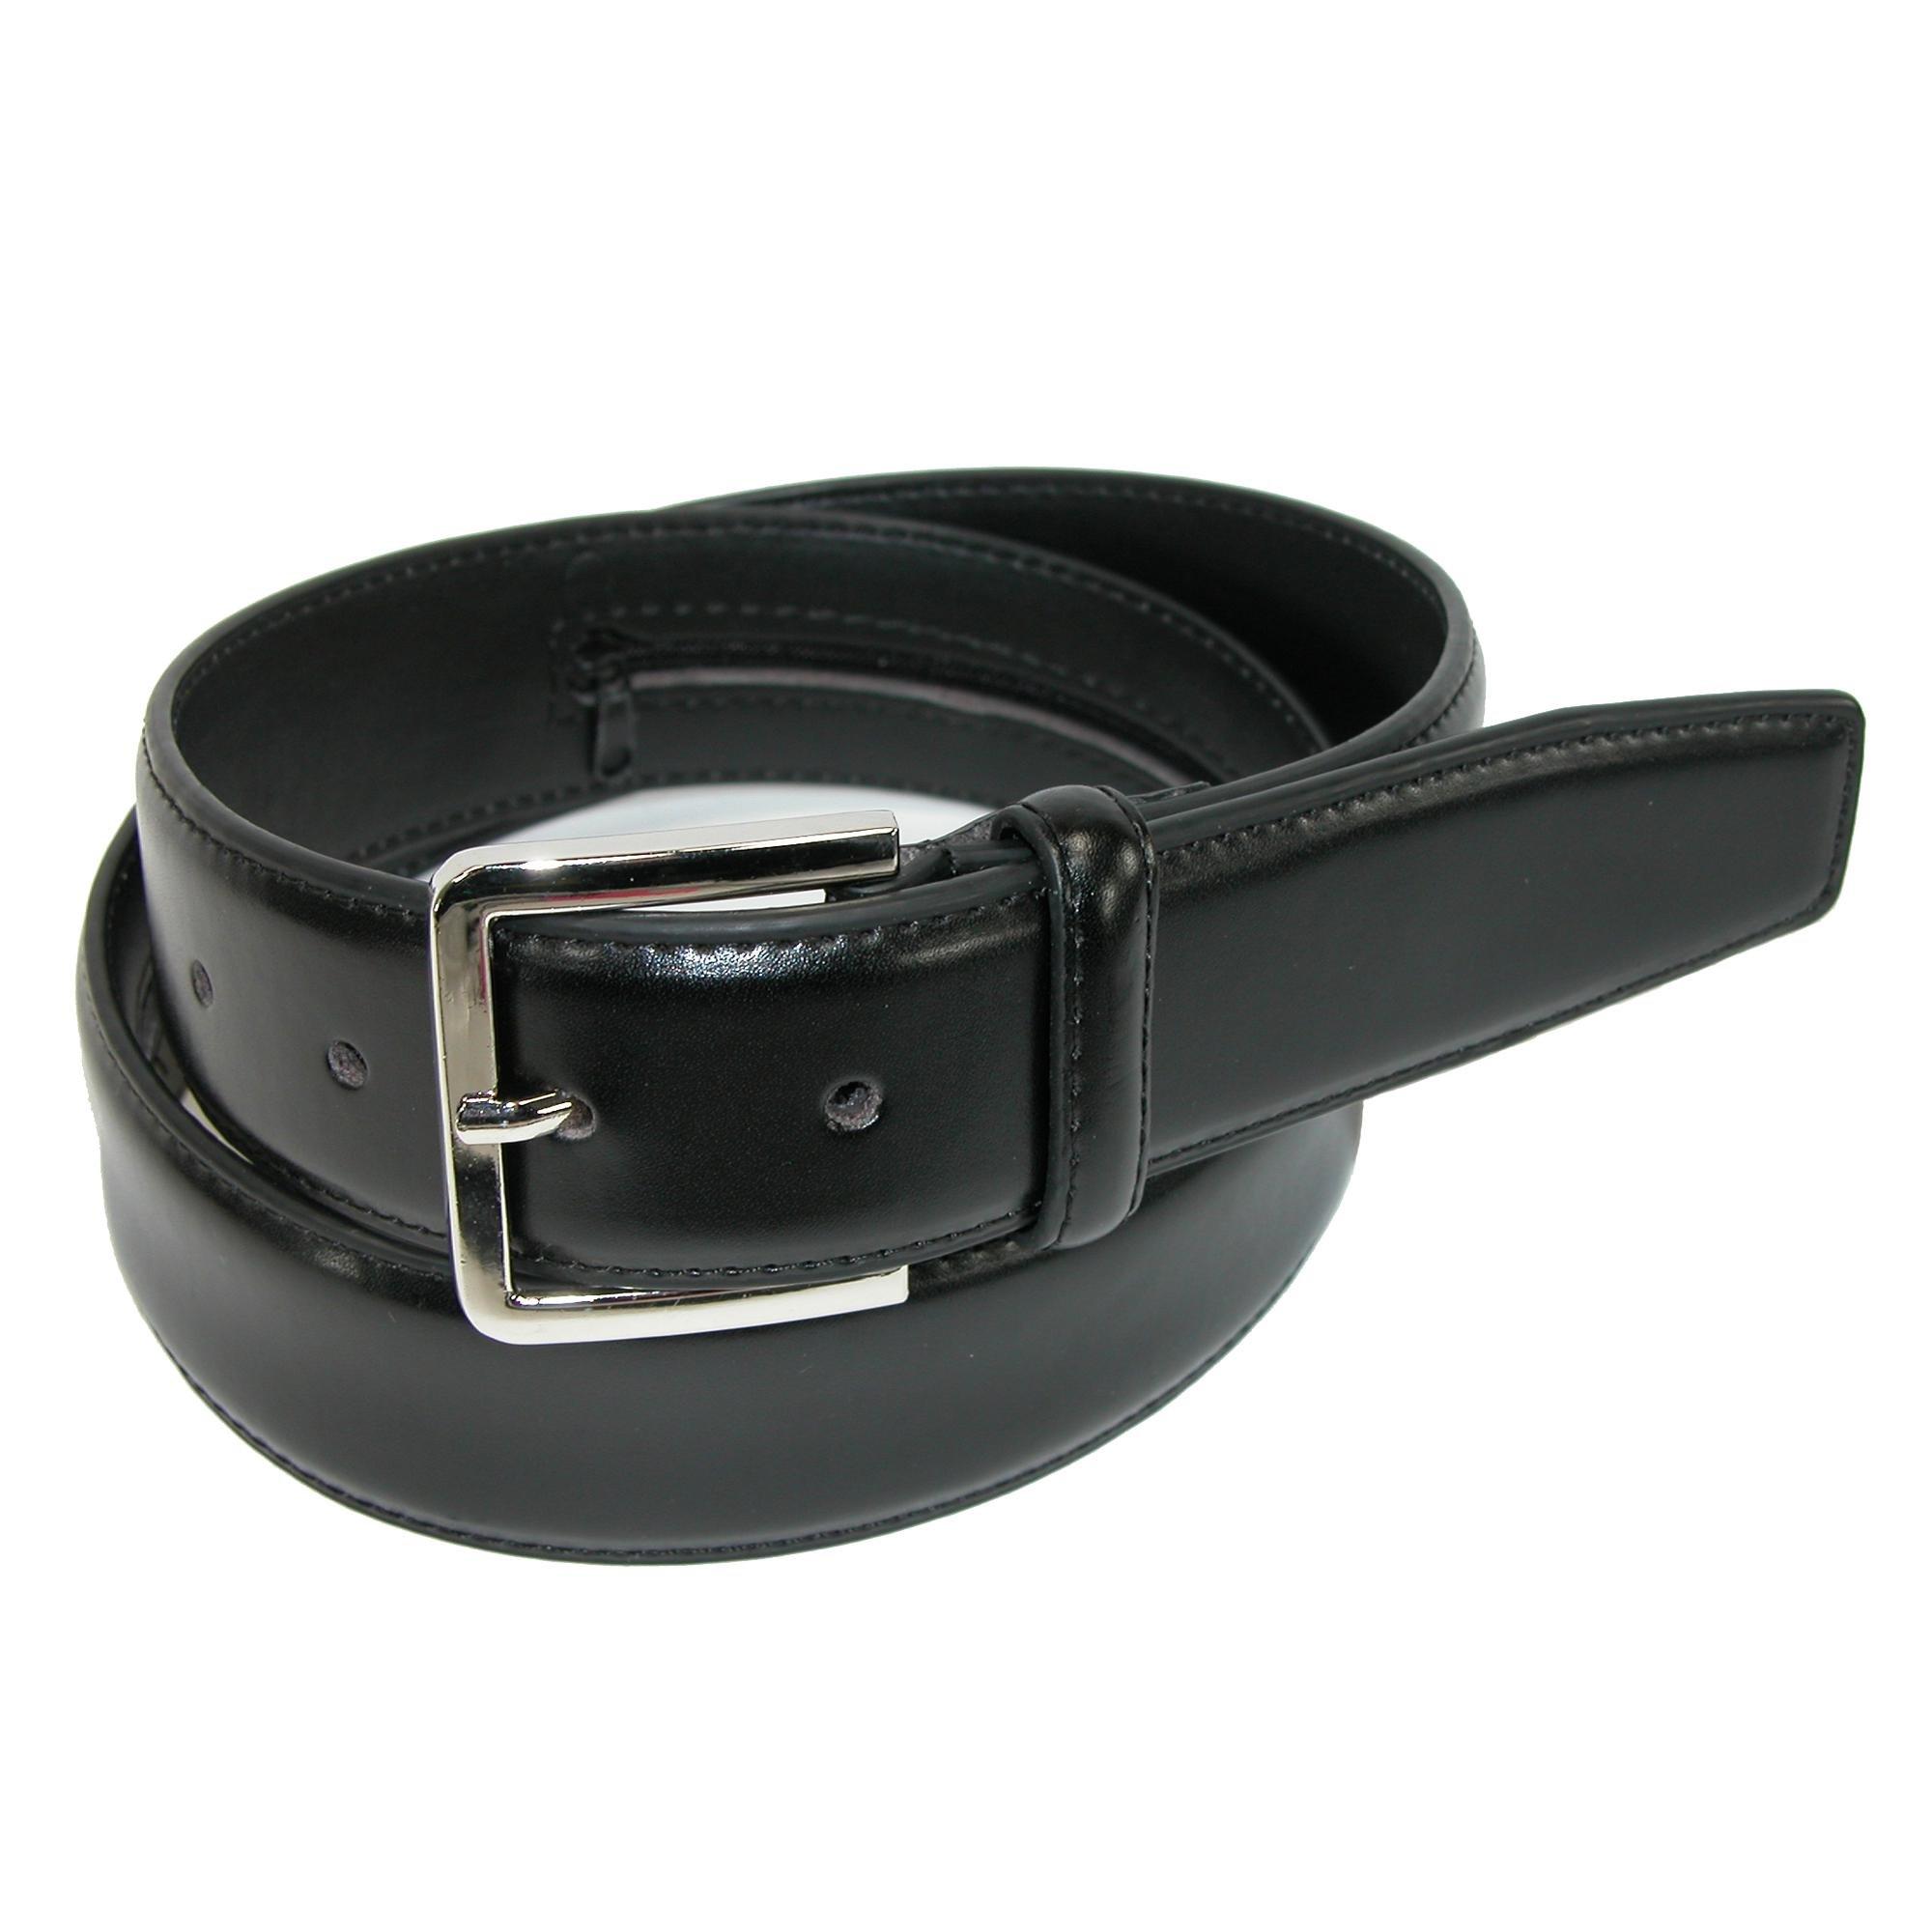 CTM Men's Leather Travel Money Belt (Large Sizes Available), 38, Black